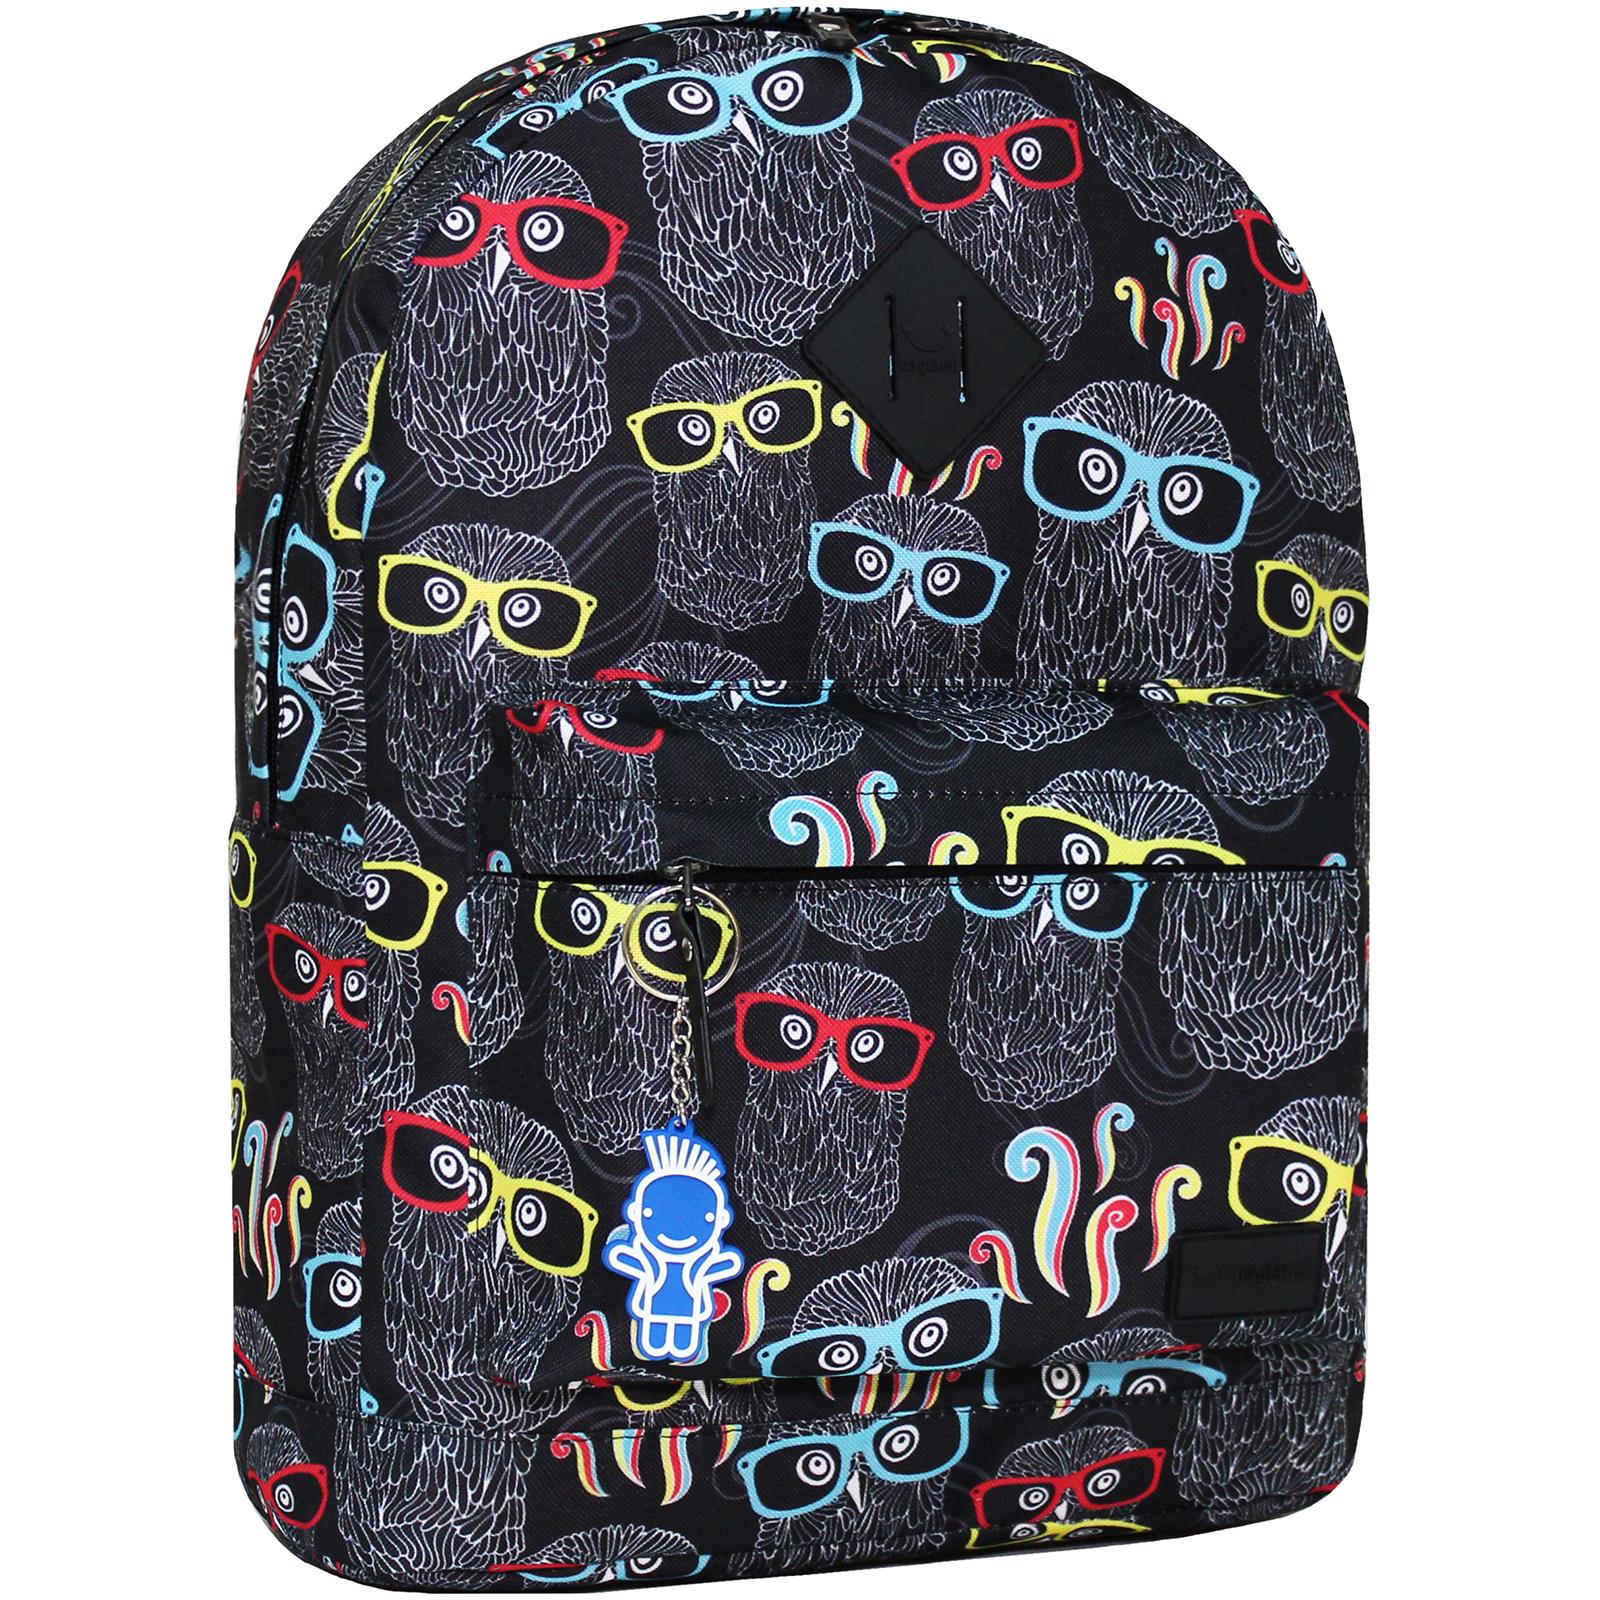 Городские рюкзаки Рюкзак Bagland Молодежный (дизайн) 17 л. сублимация 403 (00533664) IMG_7500_суб_403_.JPG